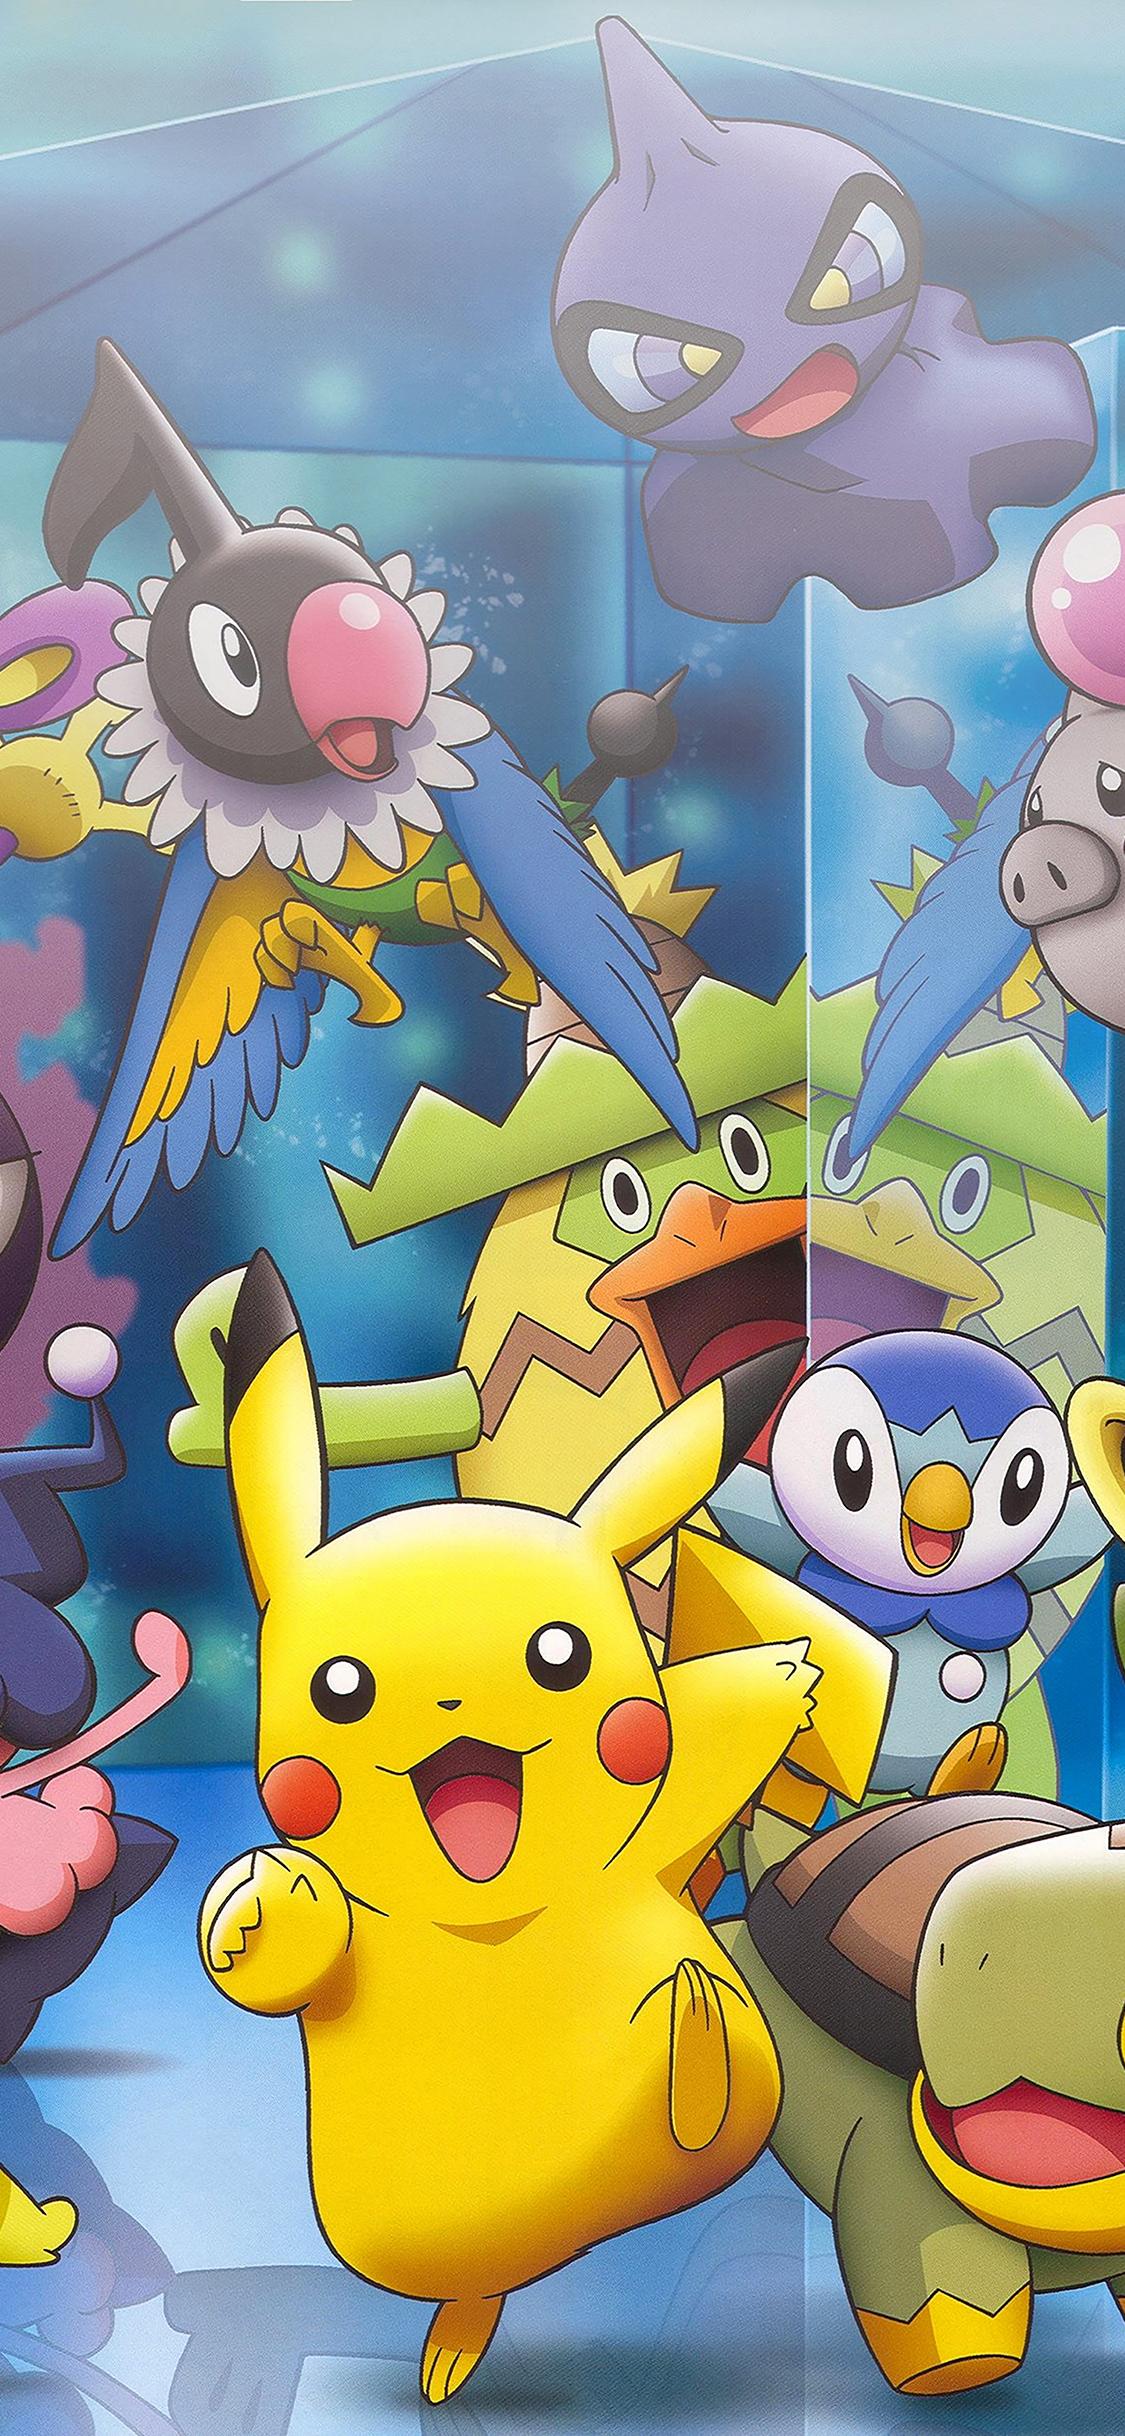 iPhoneXpapers.com-Apple-iPhone-wallpaper-ab66-wallpaper-pokemon-friends-anime